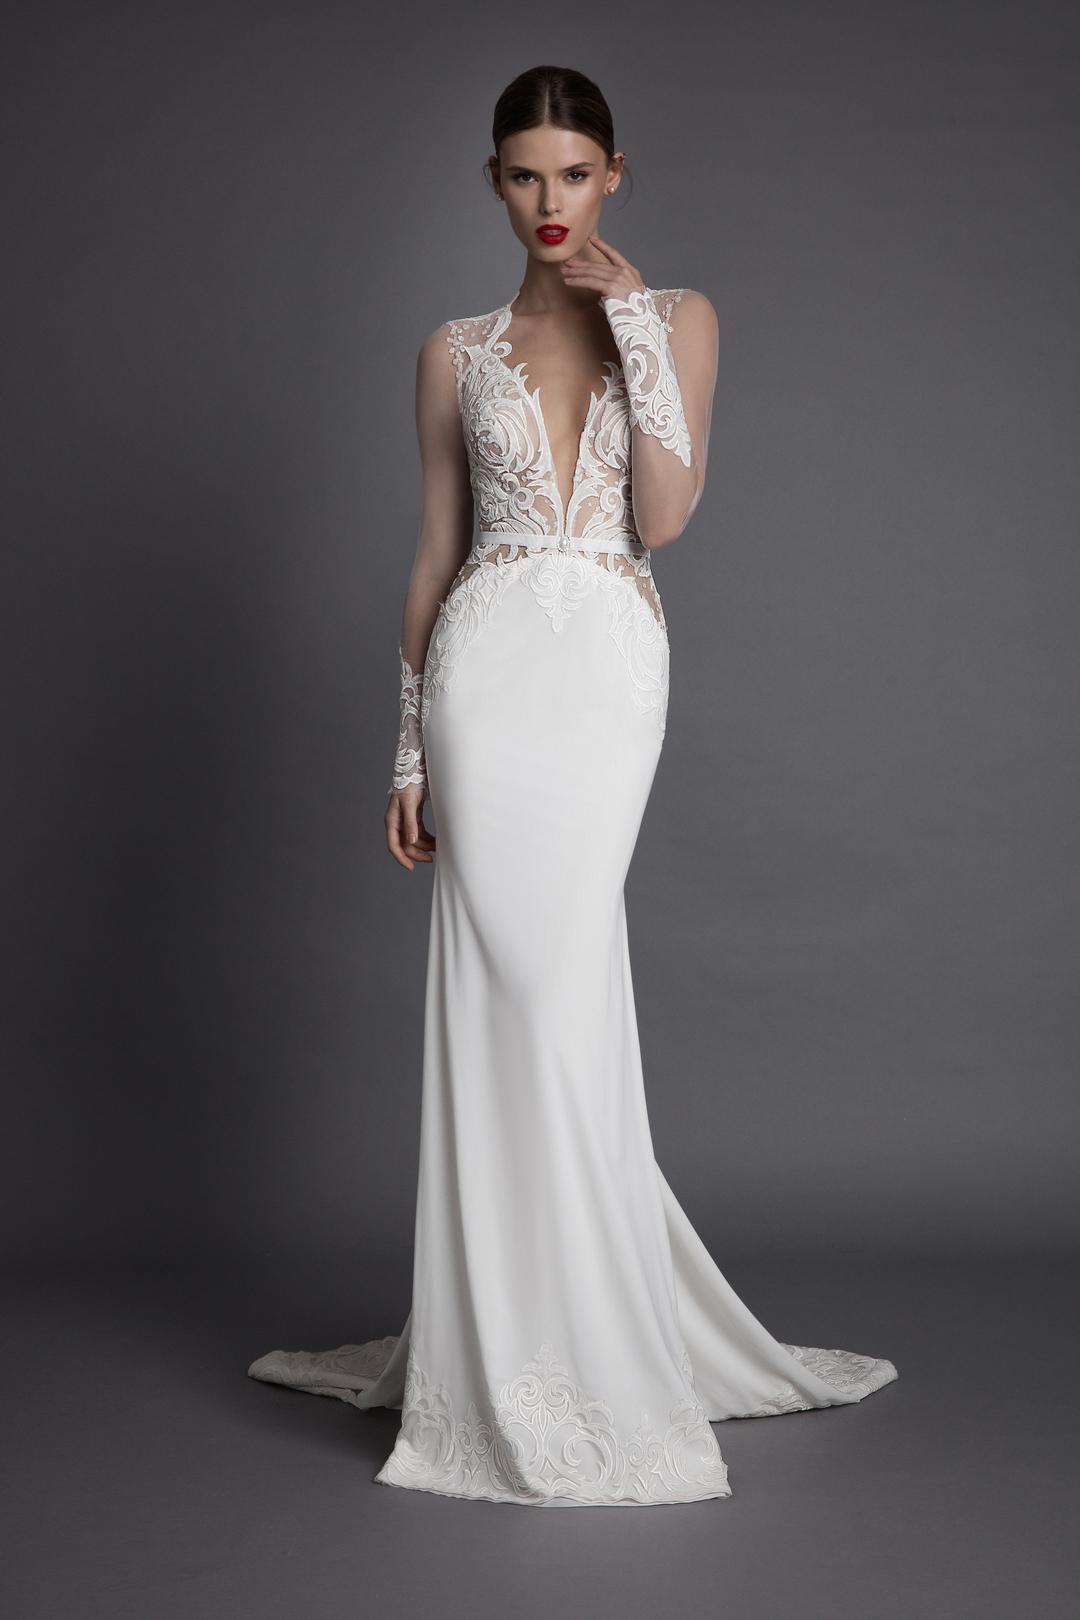 alana dress photo